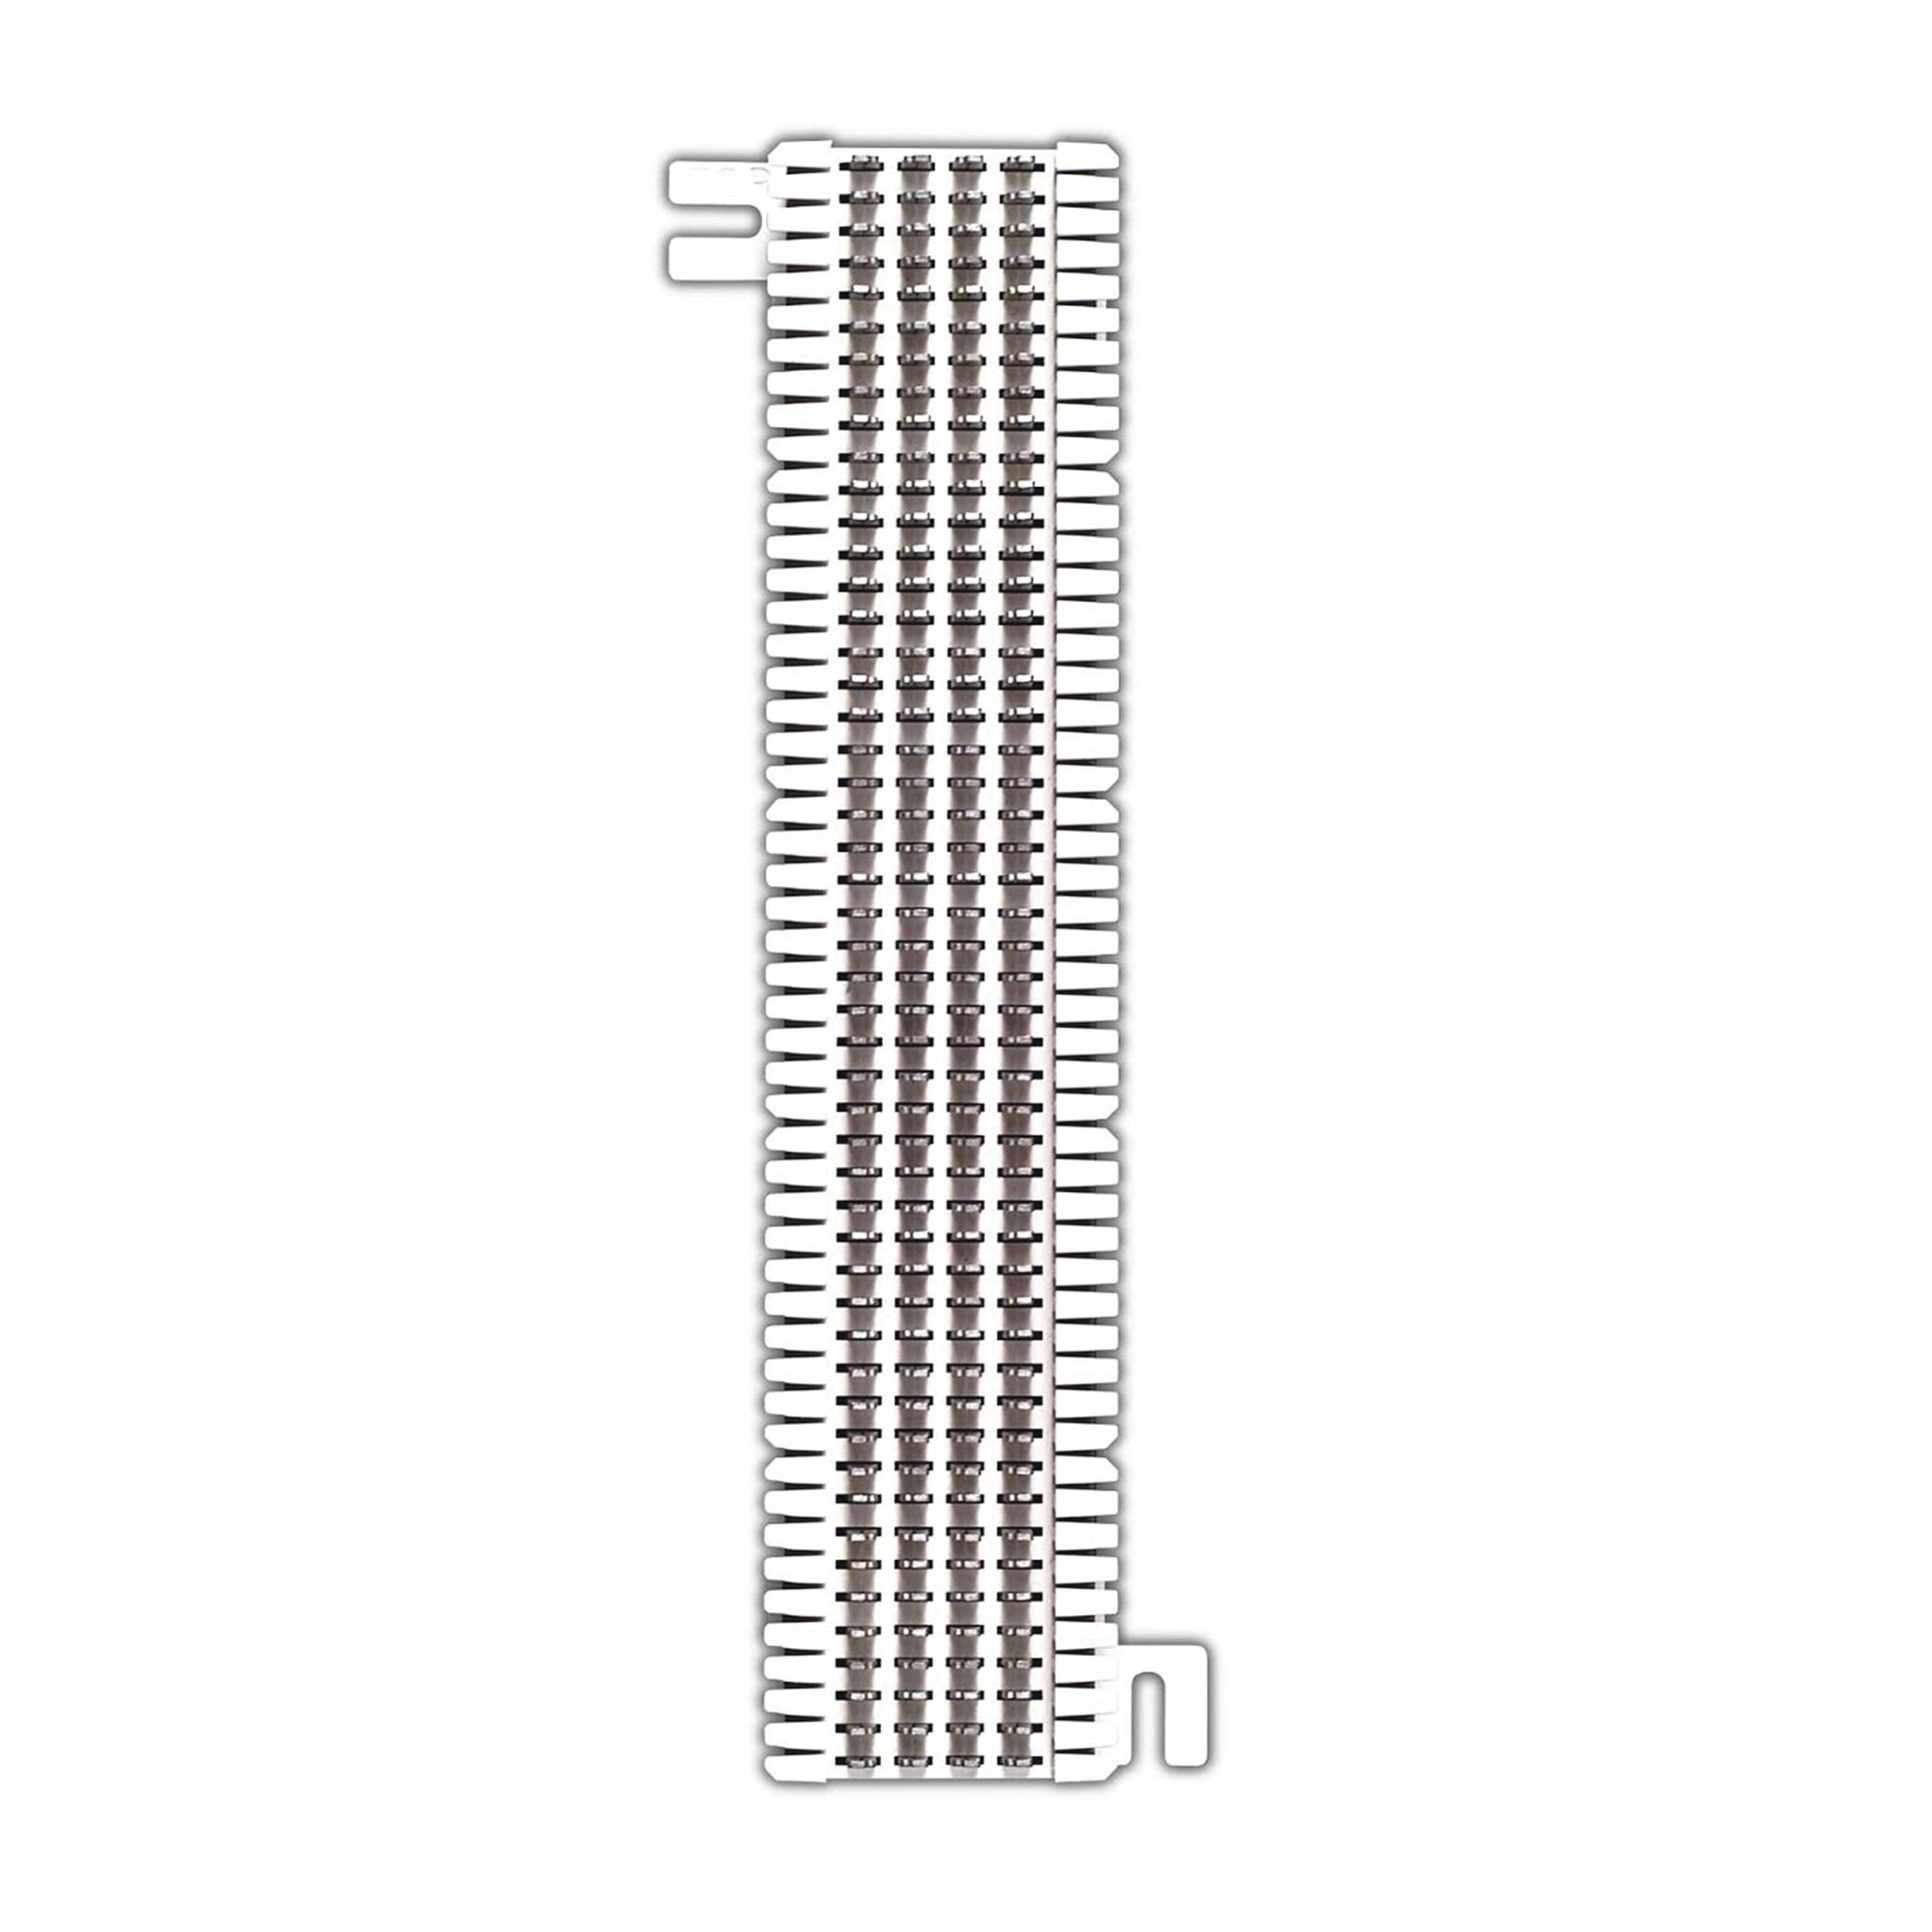 Bloque de Conexion S66, Capacidad de 50 Pares, Cat5e, Para Cable Solido 22 a 26 AWG